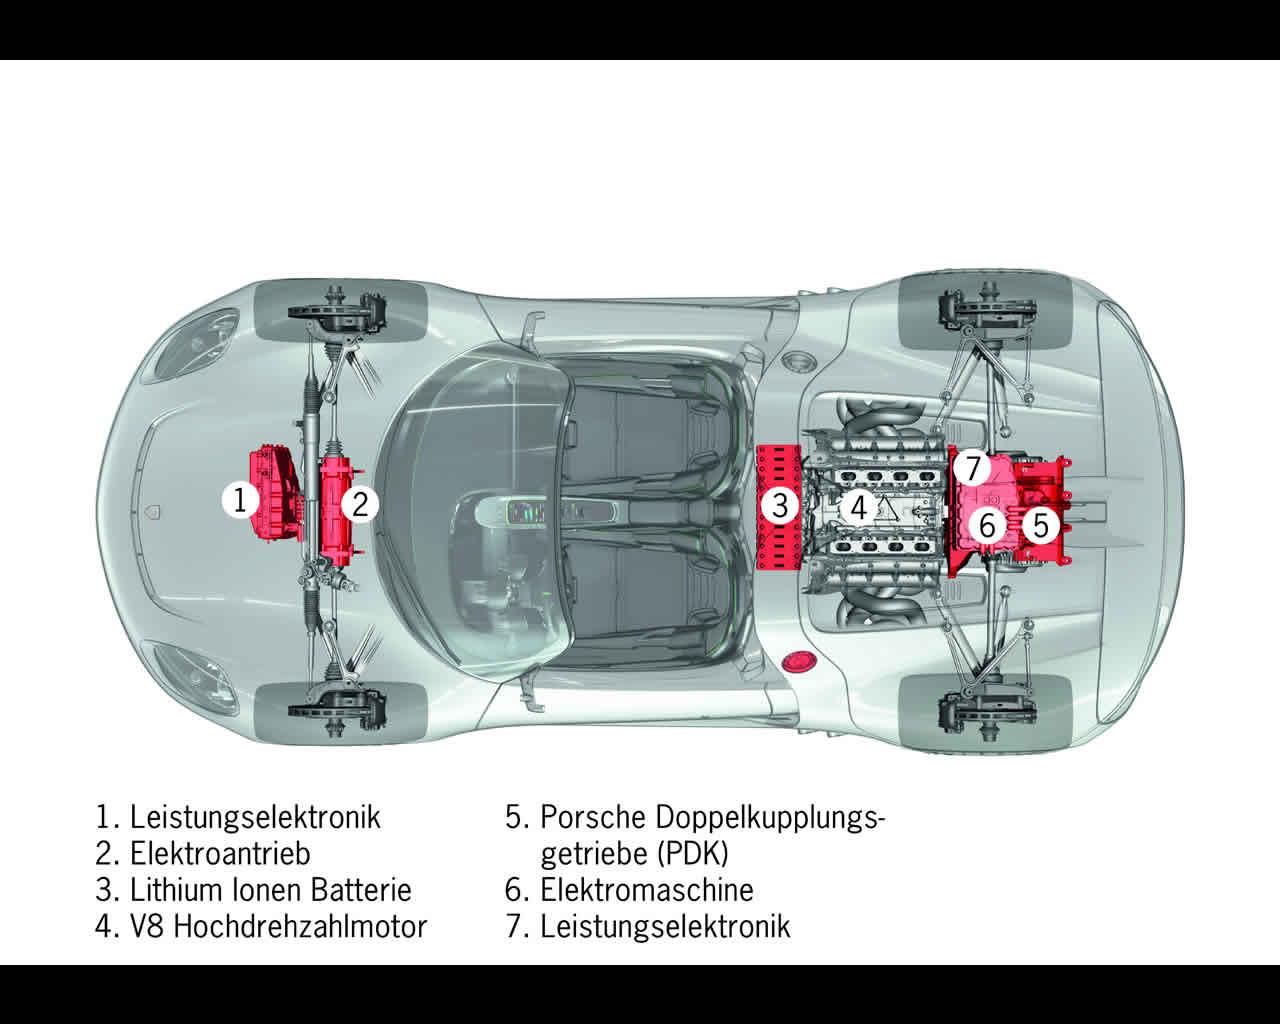 Porsche 918 Engine Diagram Trusted Wiring Diagrams Citroen Kes Plug In Hybrid High Performance Spyder 2010 Rh Autoconcept Reviews Com 2014 Open 911 Schematic